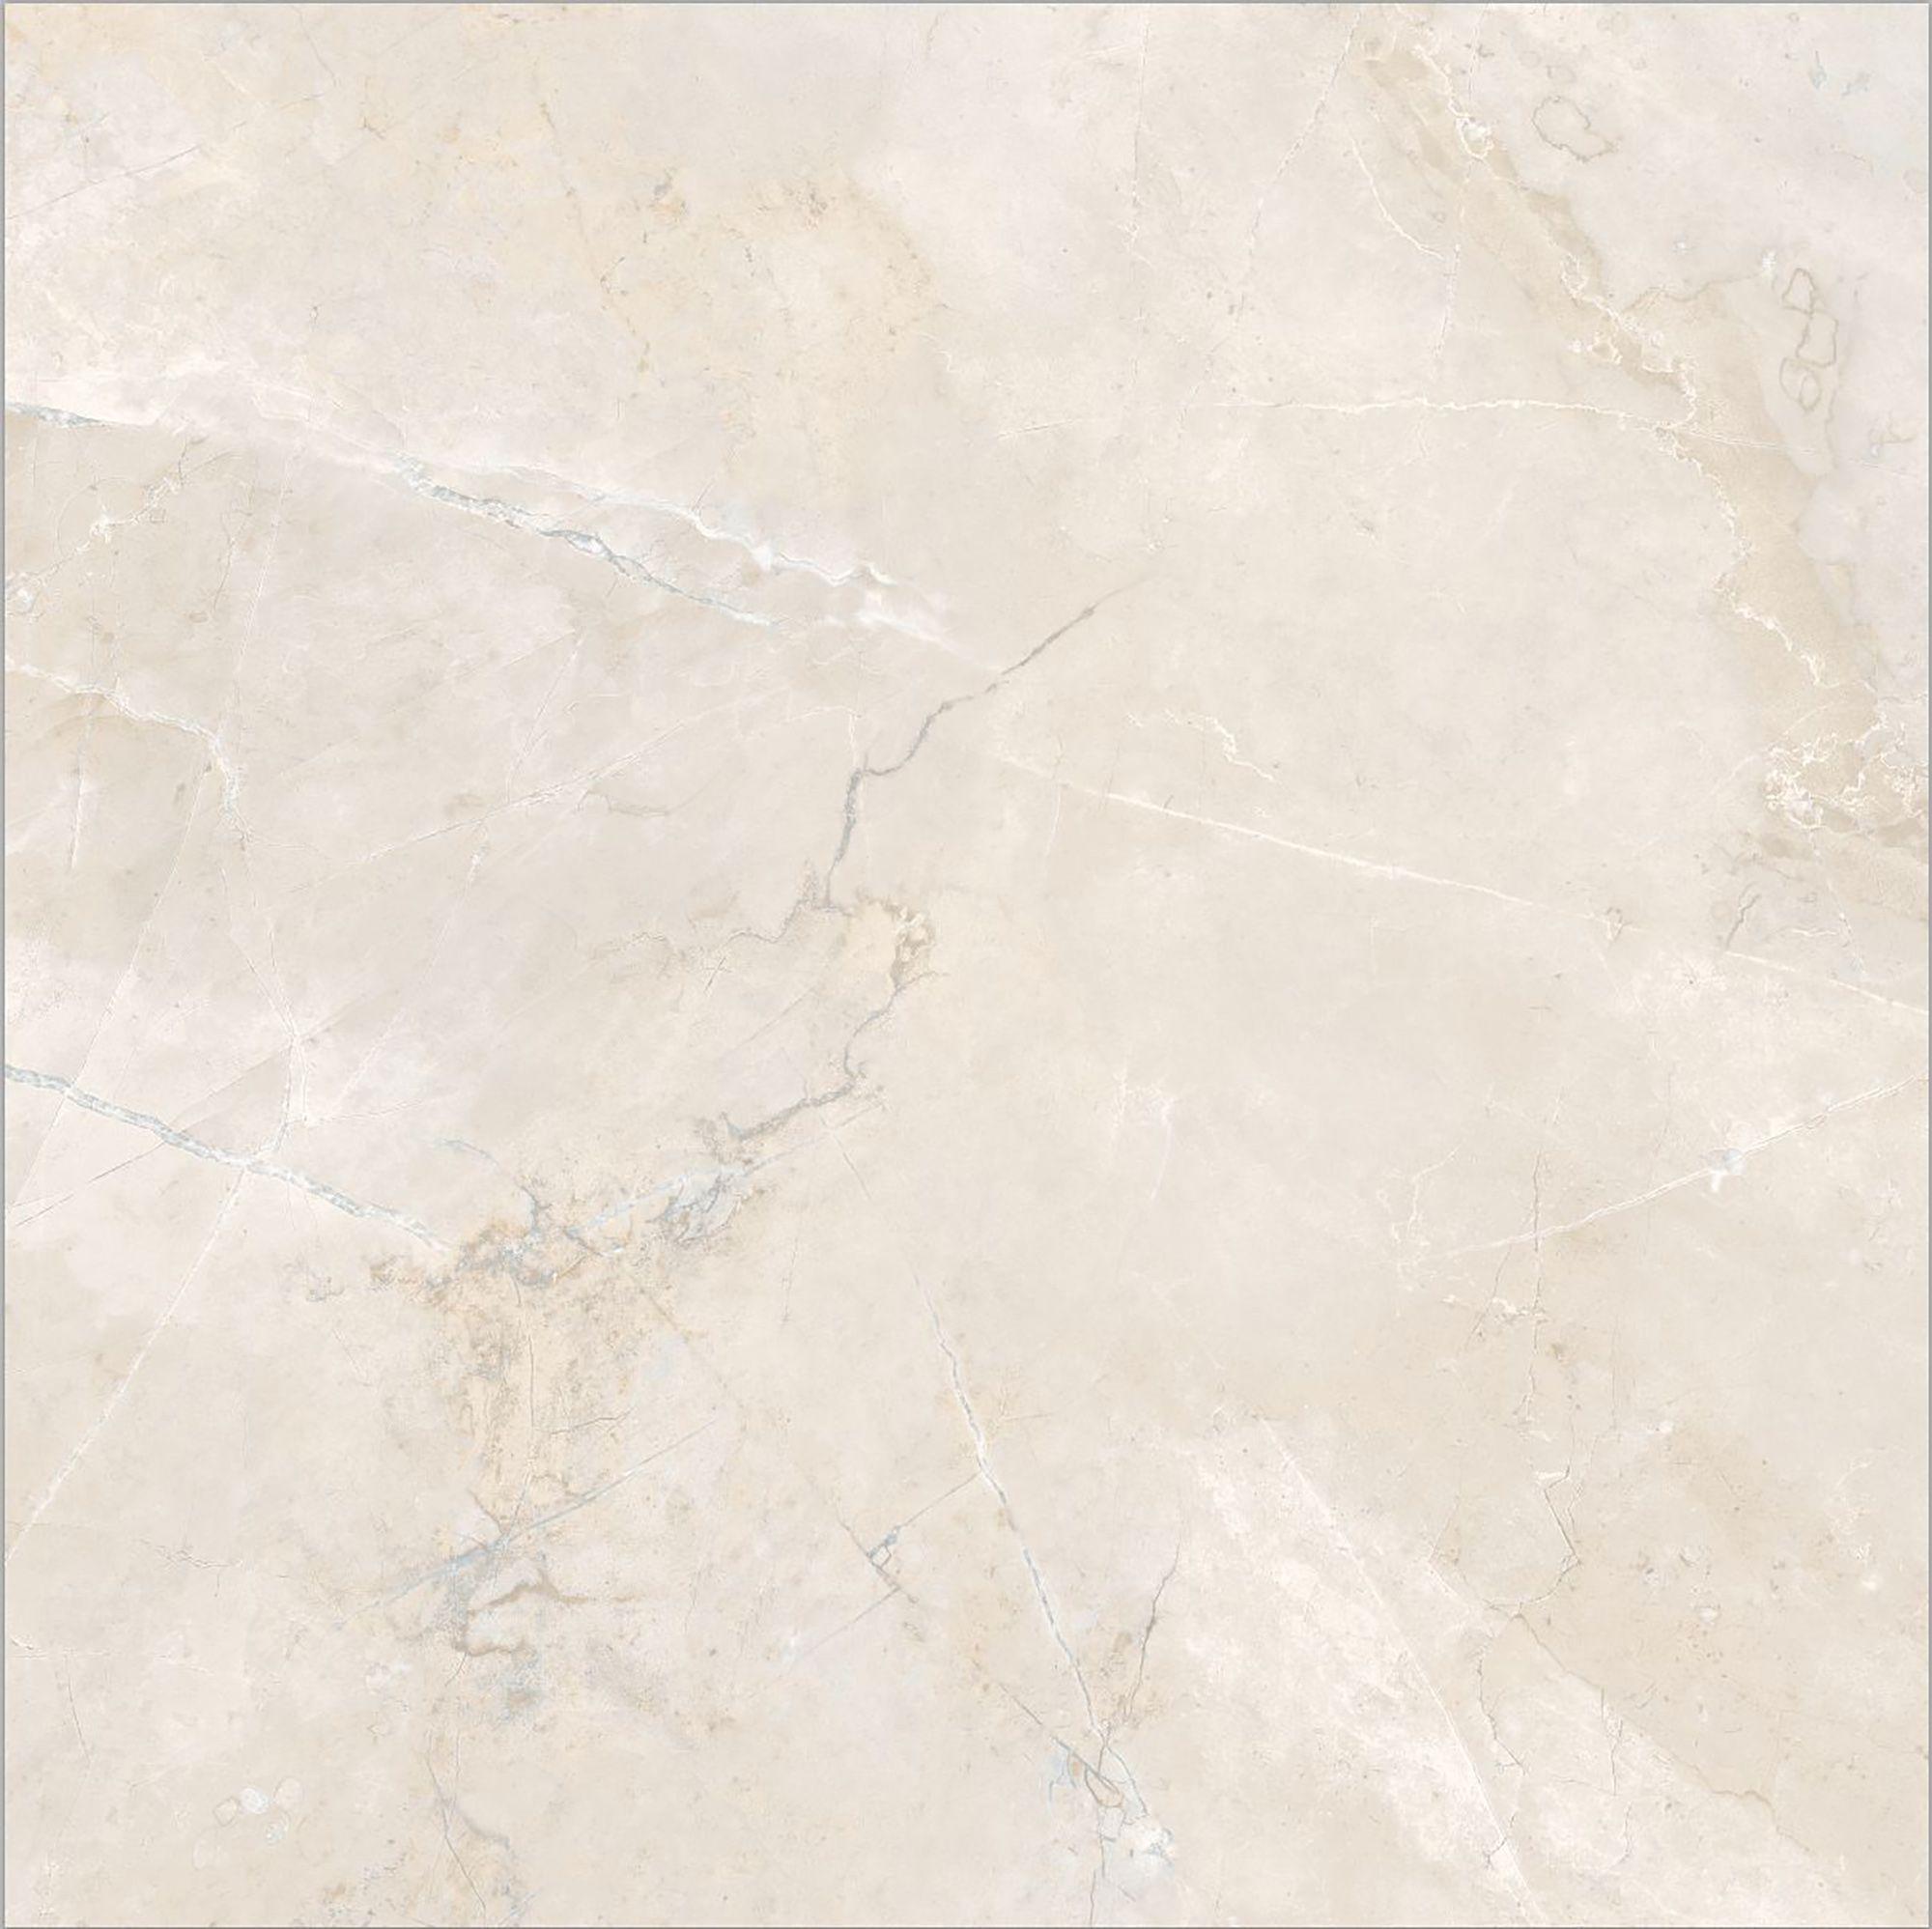 Porcelain Tile Elegante Series Bianco Polished 24 X24 Bathroomfloortiles Kitchentiles Kitchenflooring T Ceramic Floor Tile Flooring Living Room Tiles